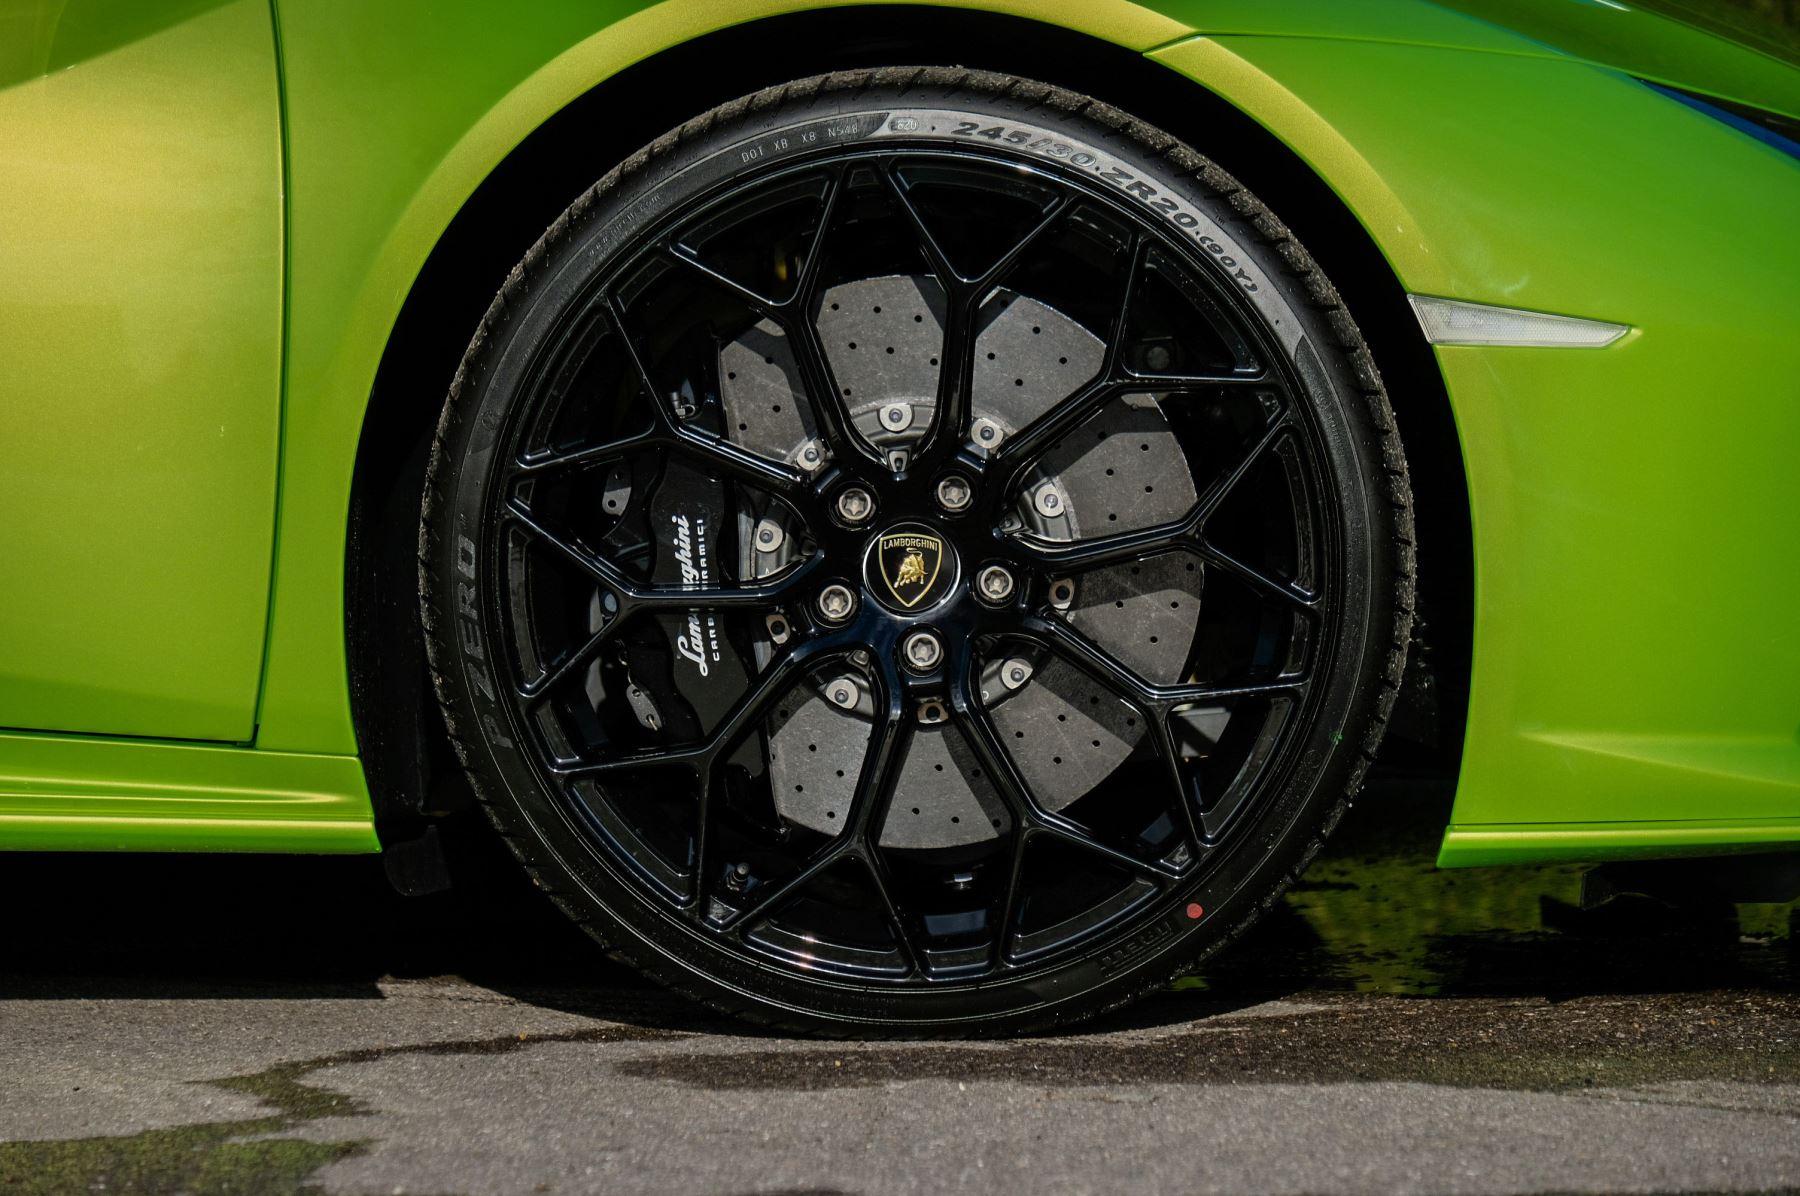 Lamborghini Huracan EVO Spyder 5.2 V10 610 2dr Auto image 9